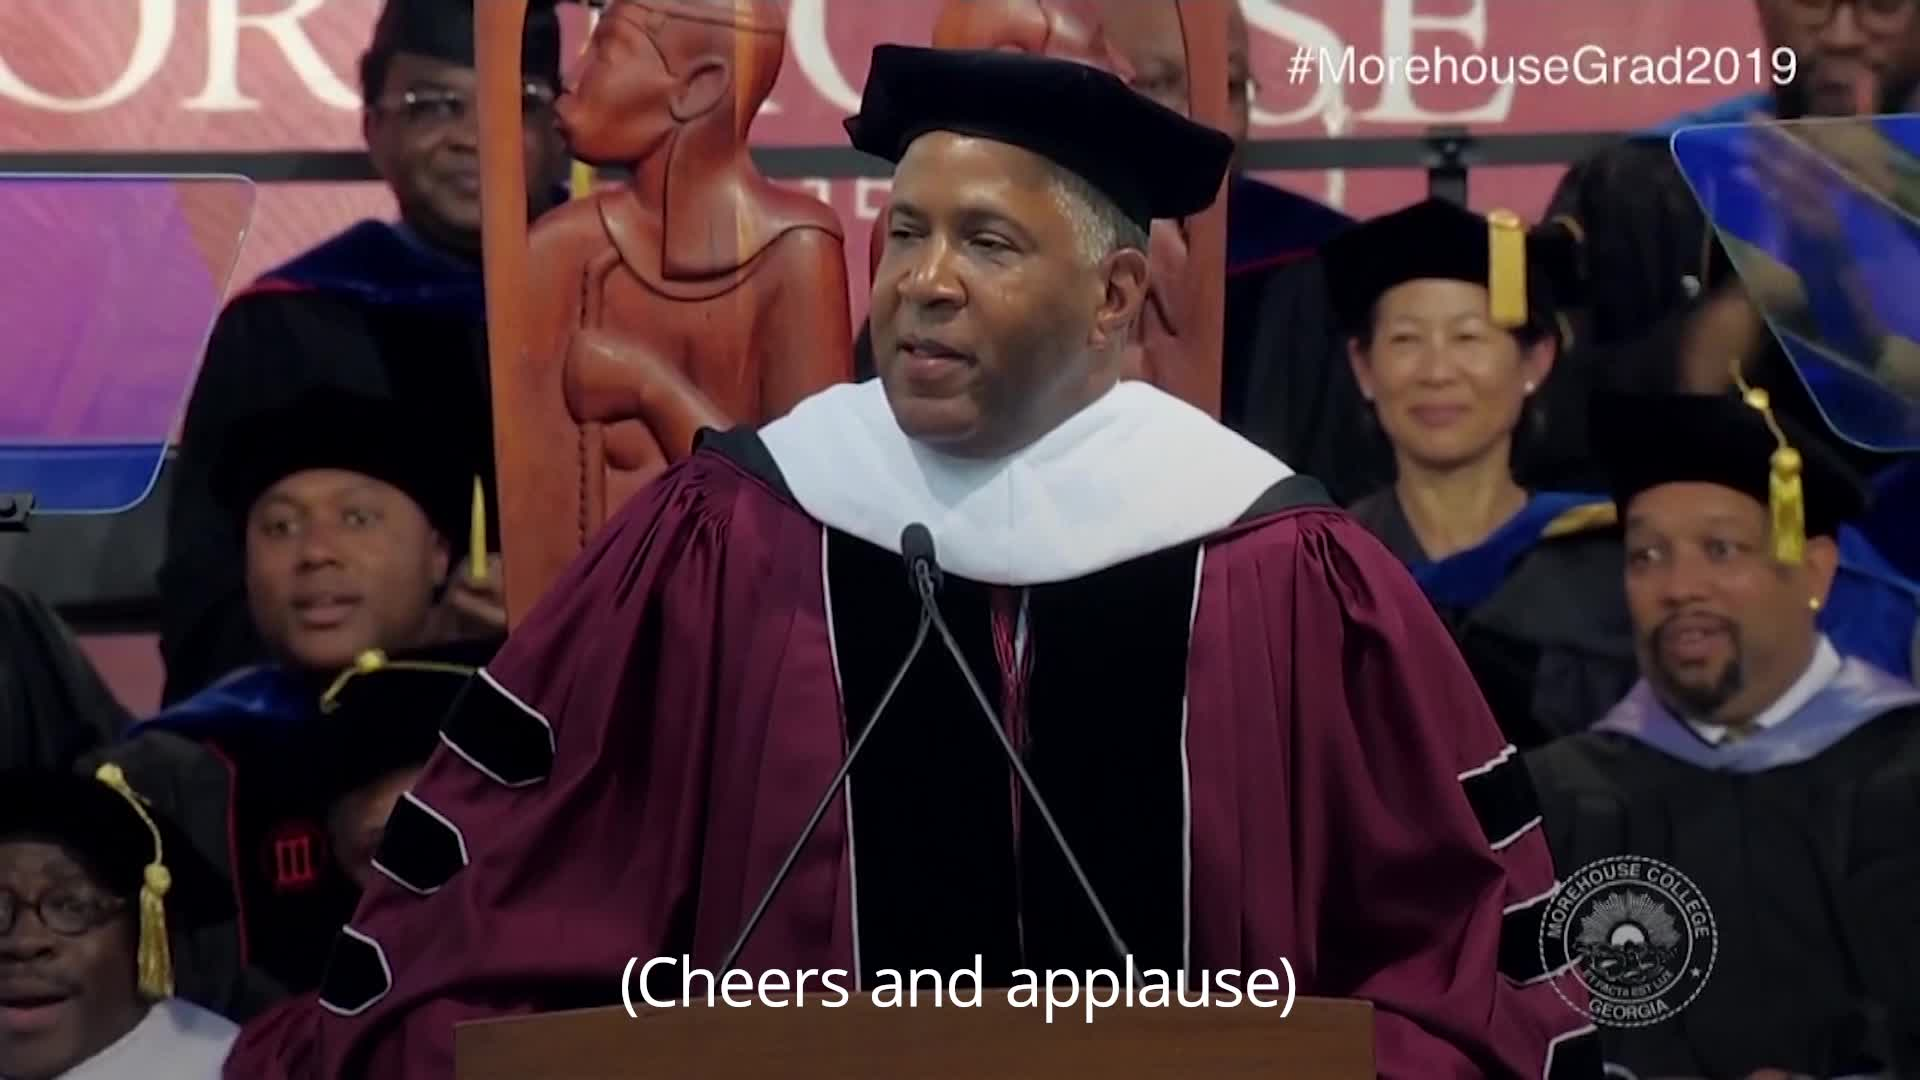 Billionaire Pledges To Pay Off Students' Debts During University Commencement Speech